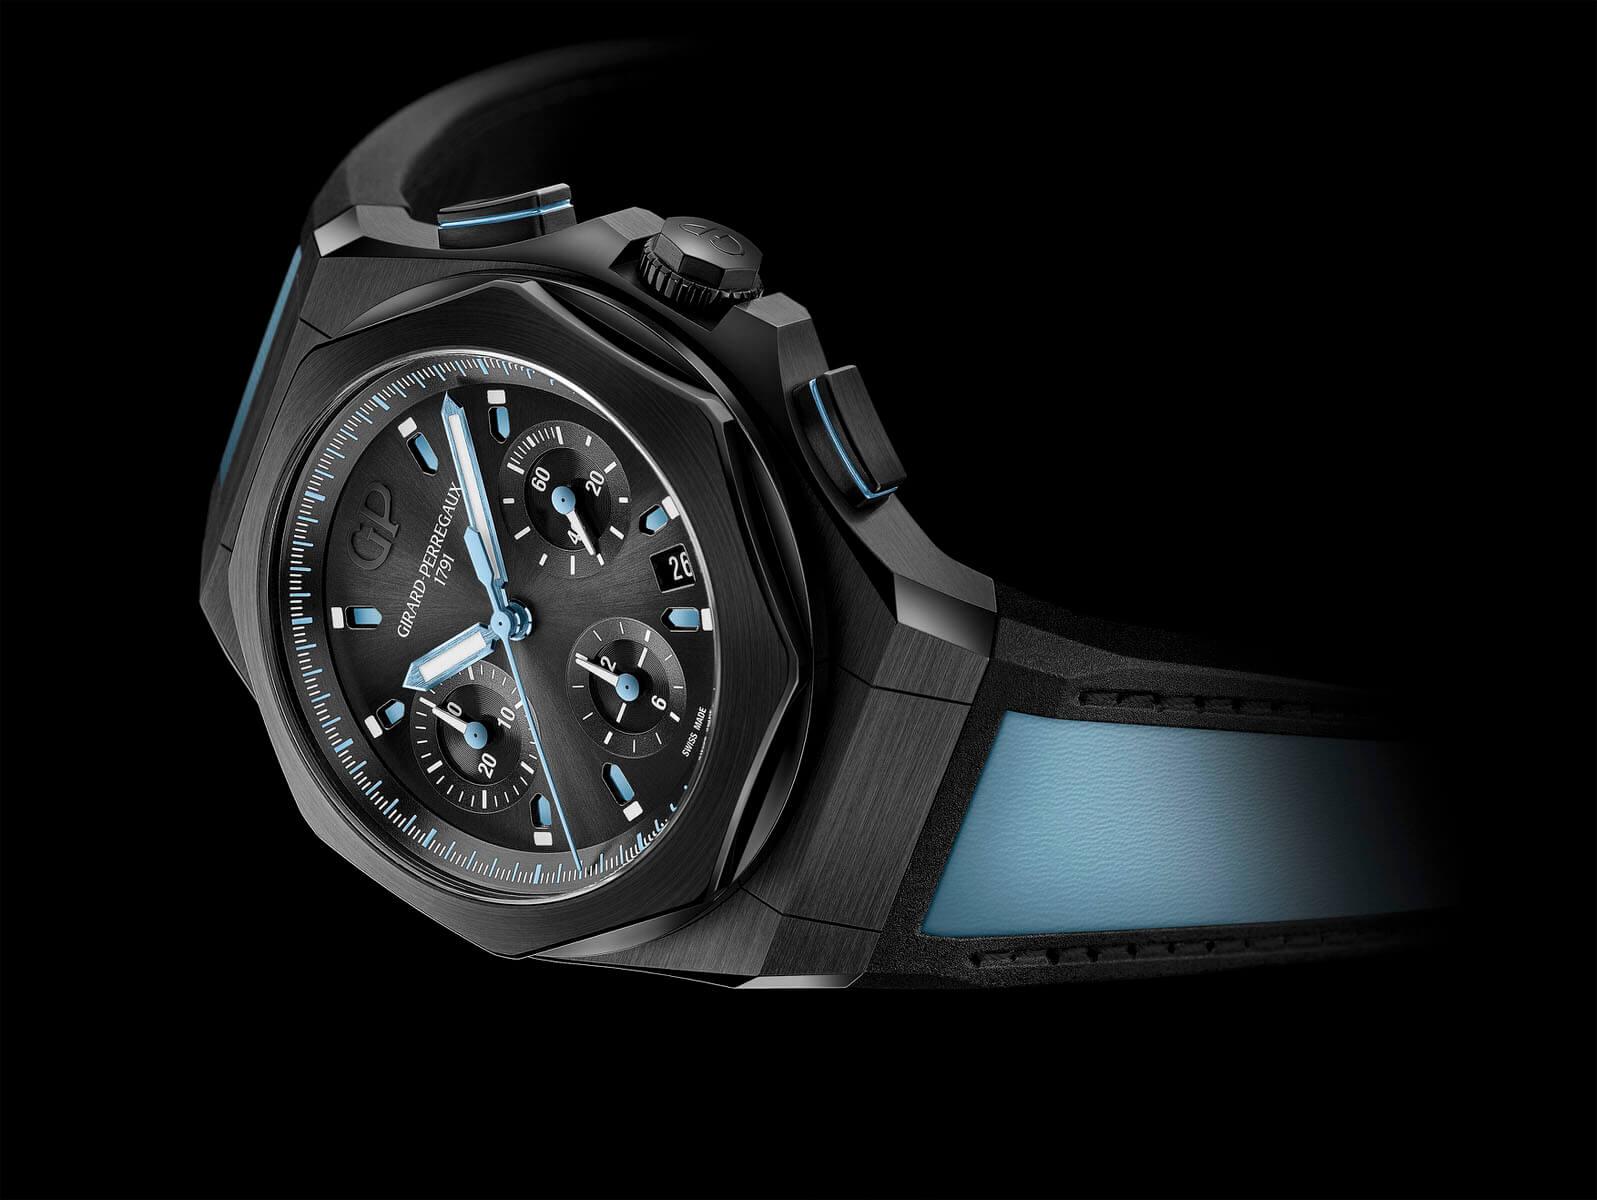 Girard-Perregaux Laureato Absolute Chronograph Only watch portada debajo del reloj